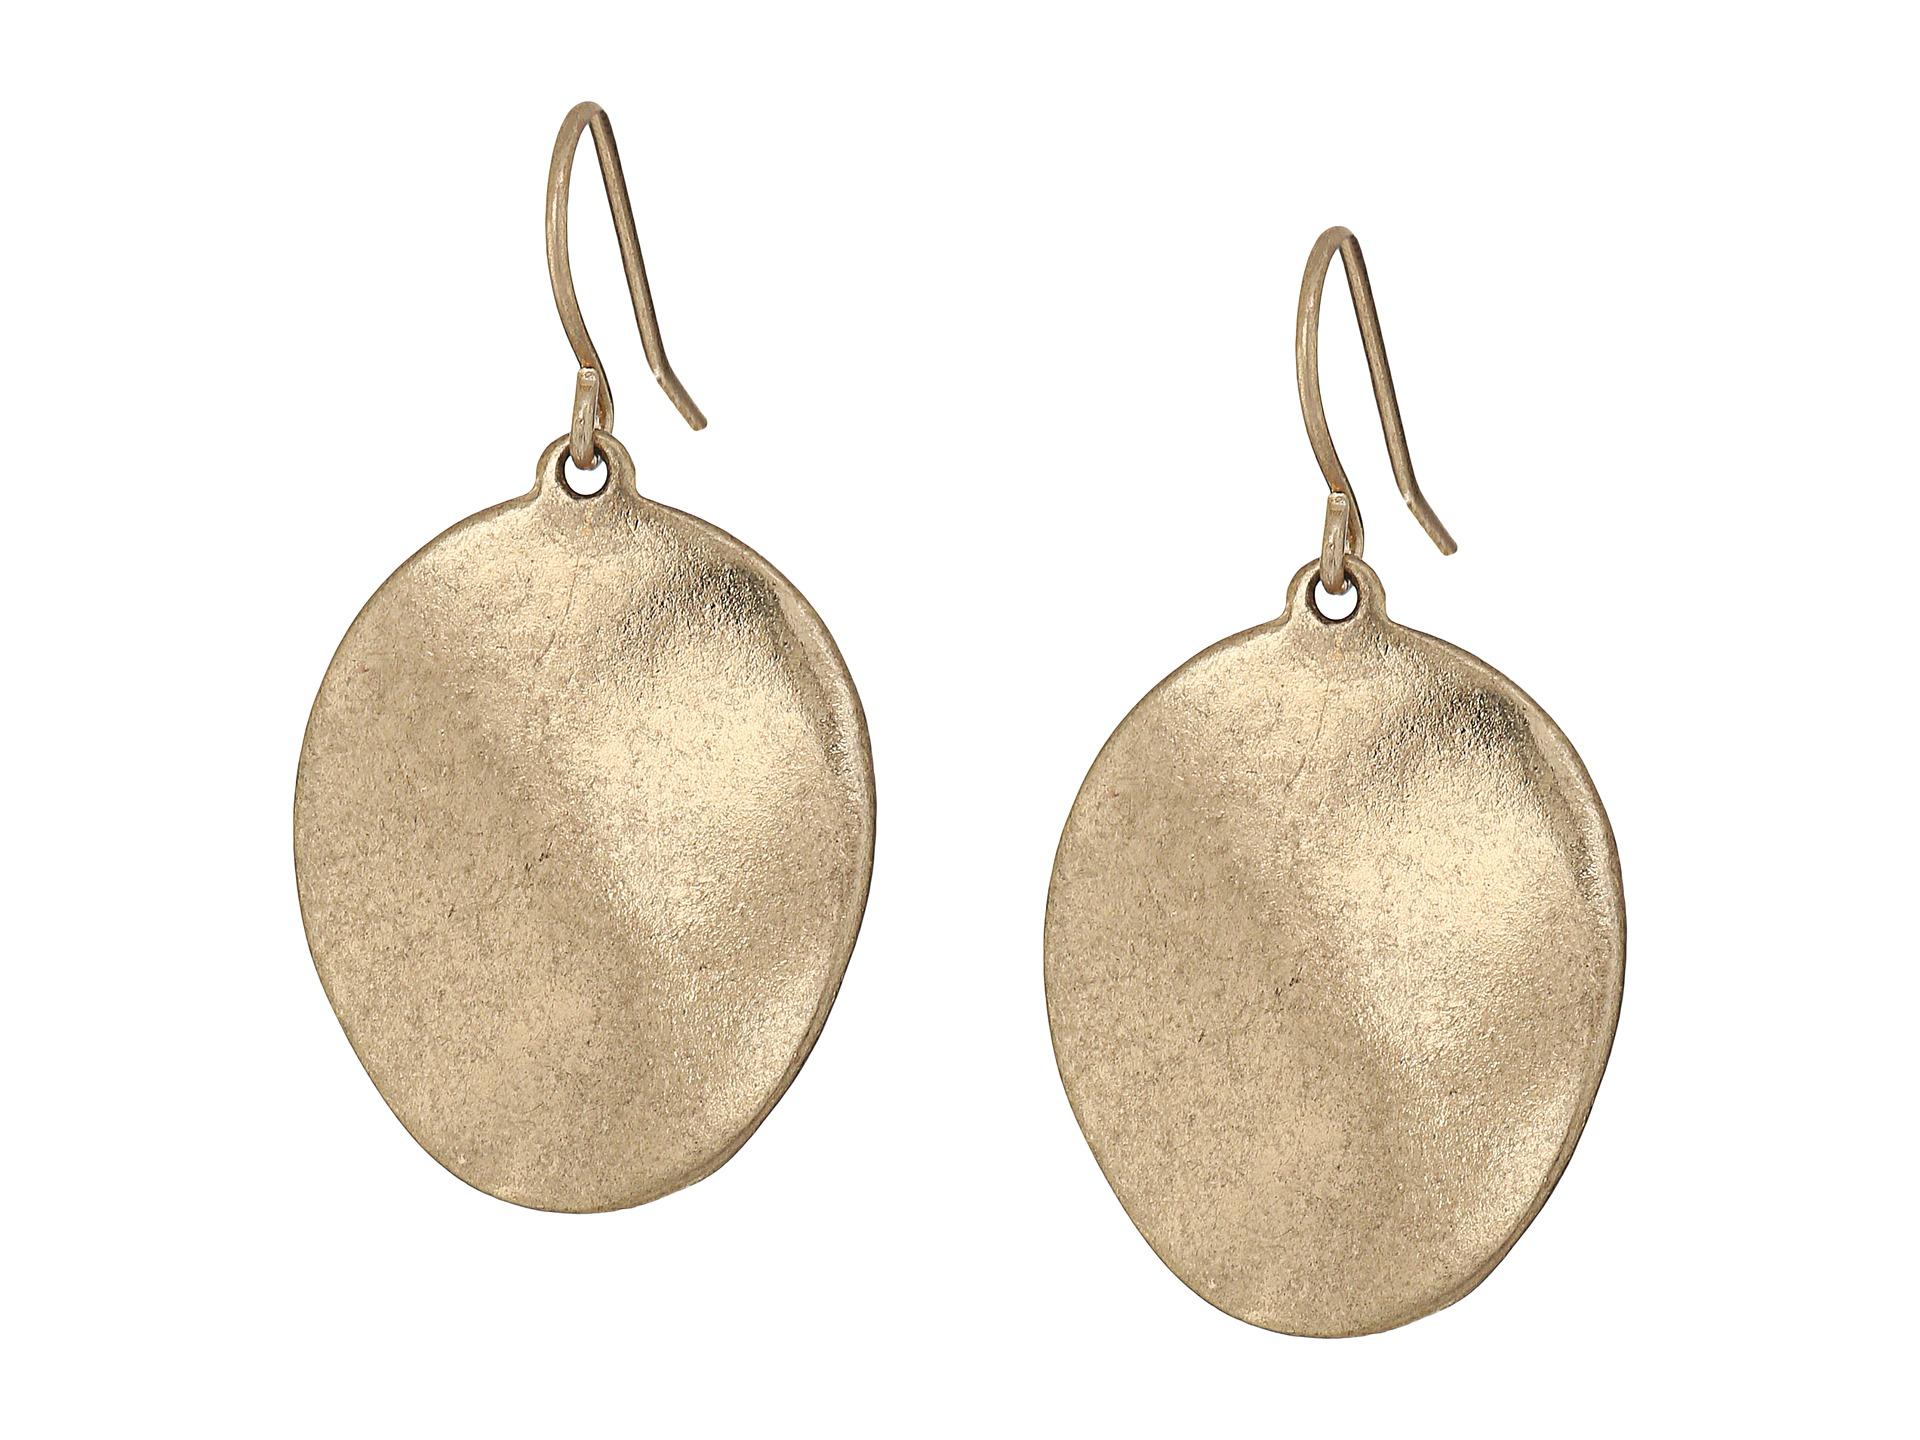 The Sak Wavy Disc Drop Earrings At Zappos.com